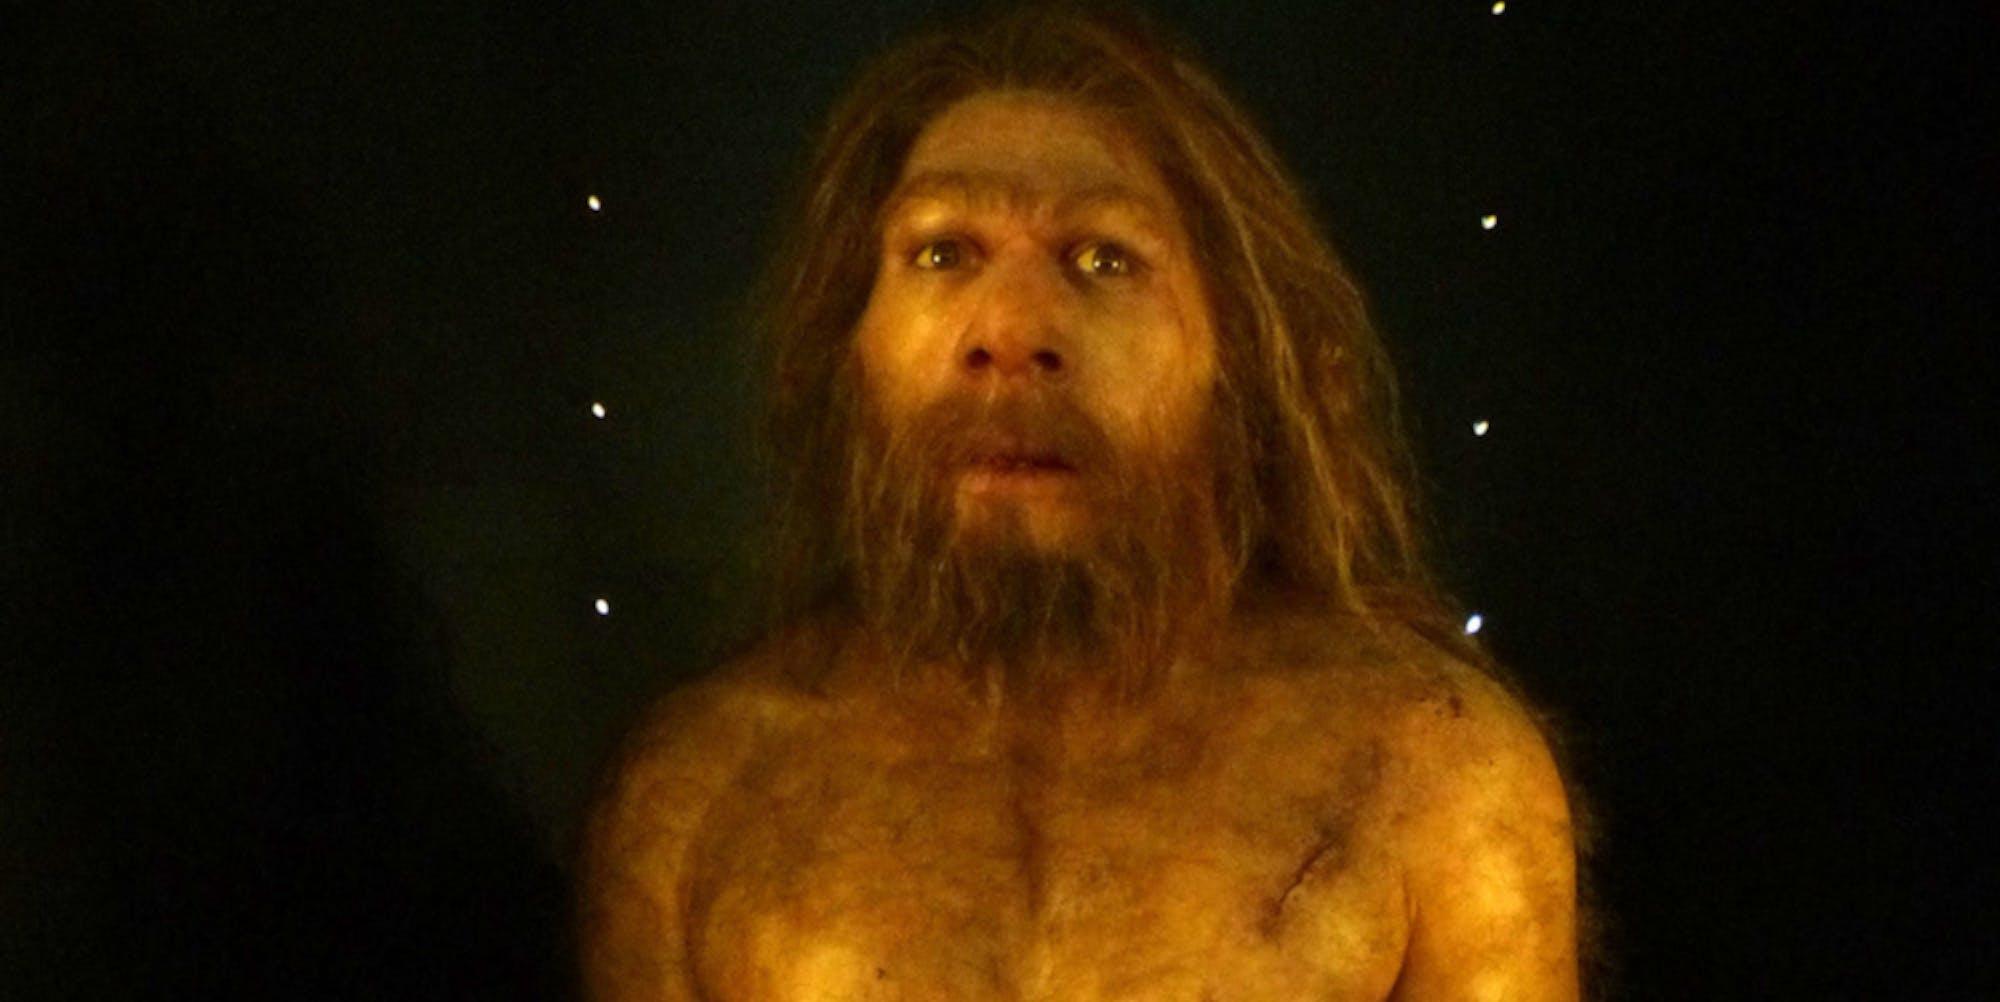 Neanderthals Passed Down Life-Saving Genes to Their Human